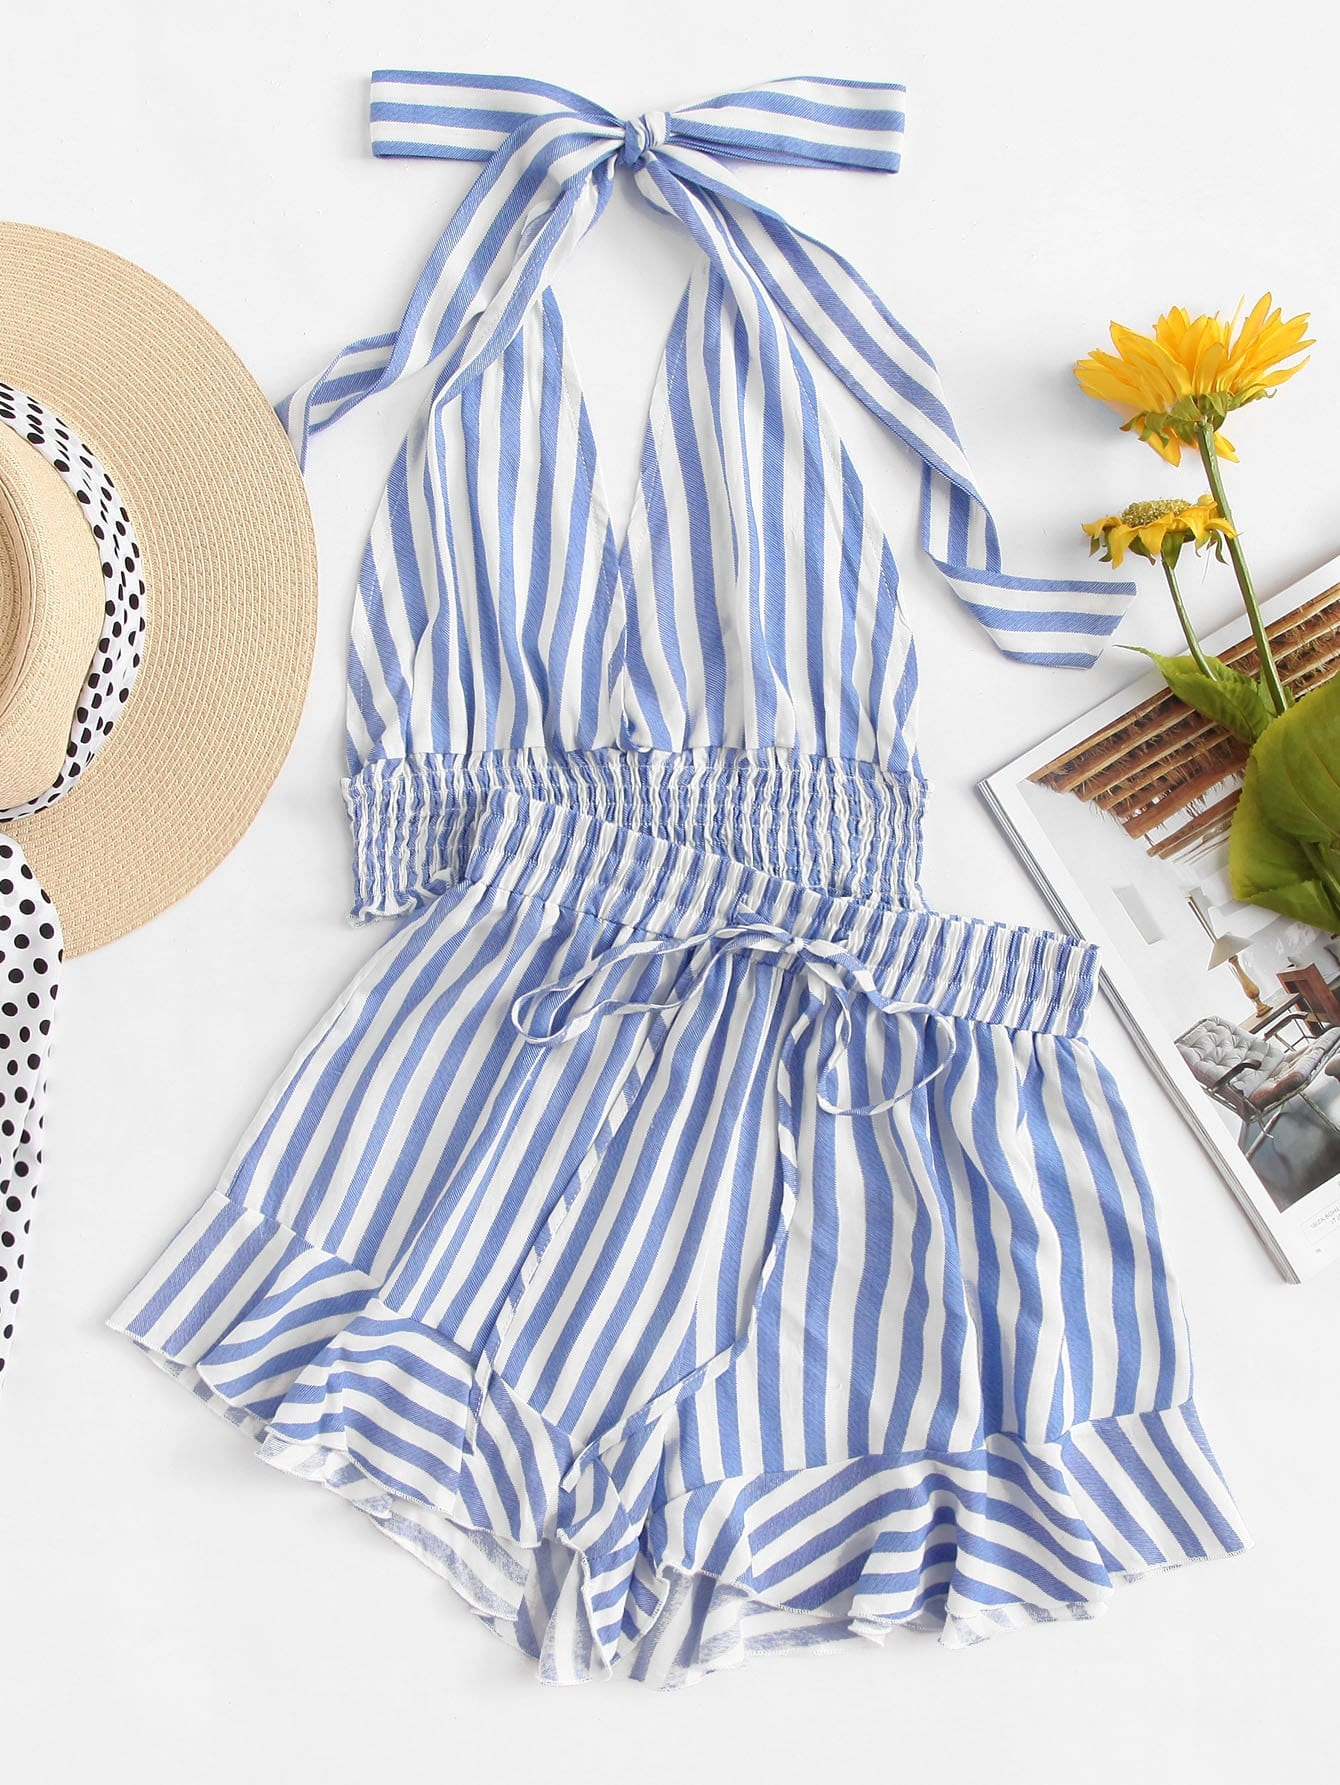 Striped Halter Neck Top & Ruffle Shorts Set coffee tube top halter bikin set